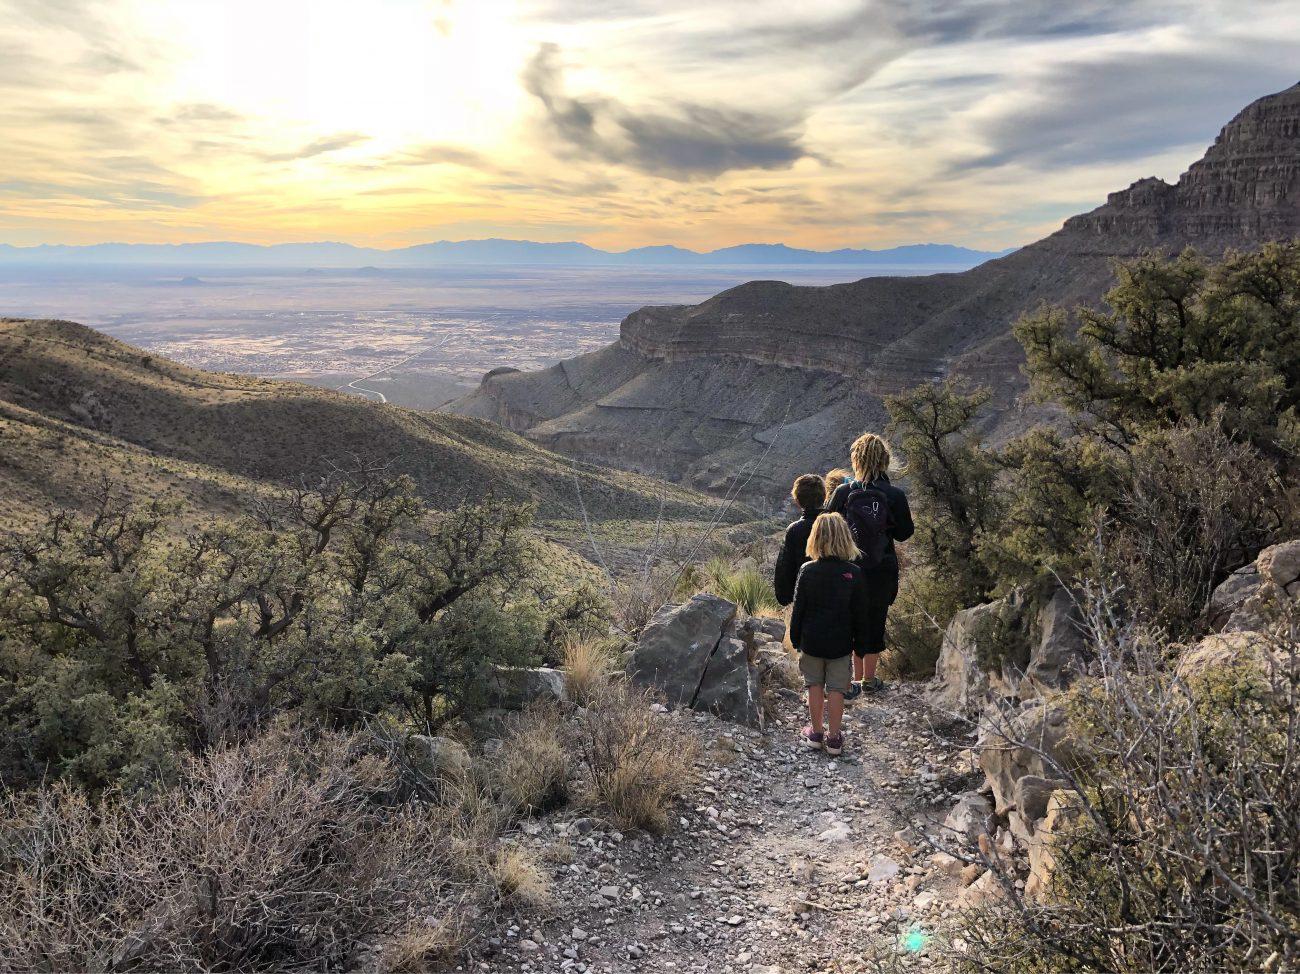 365 Mile Challenge - Tiny Shiny Hike